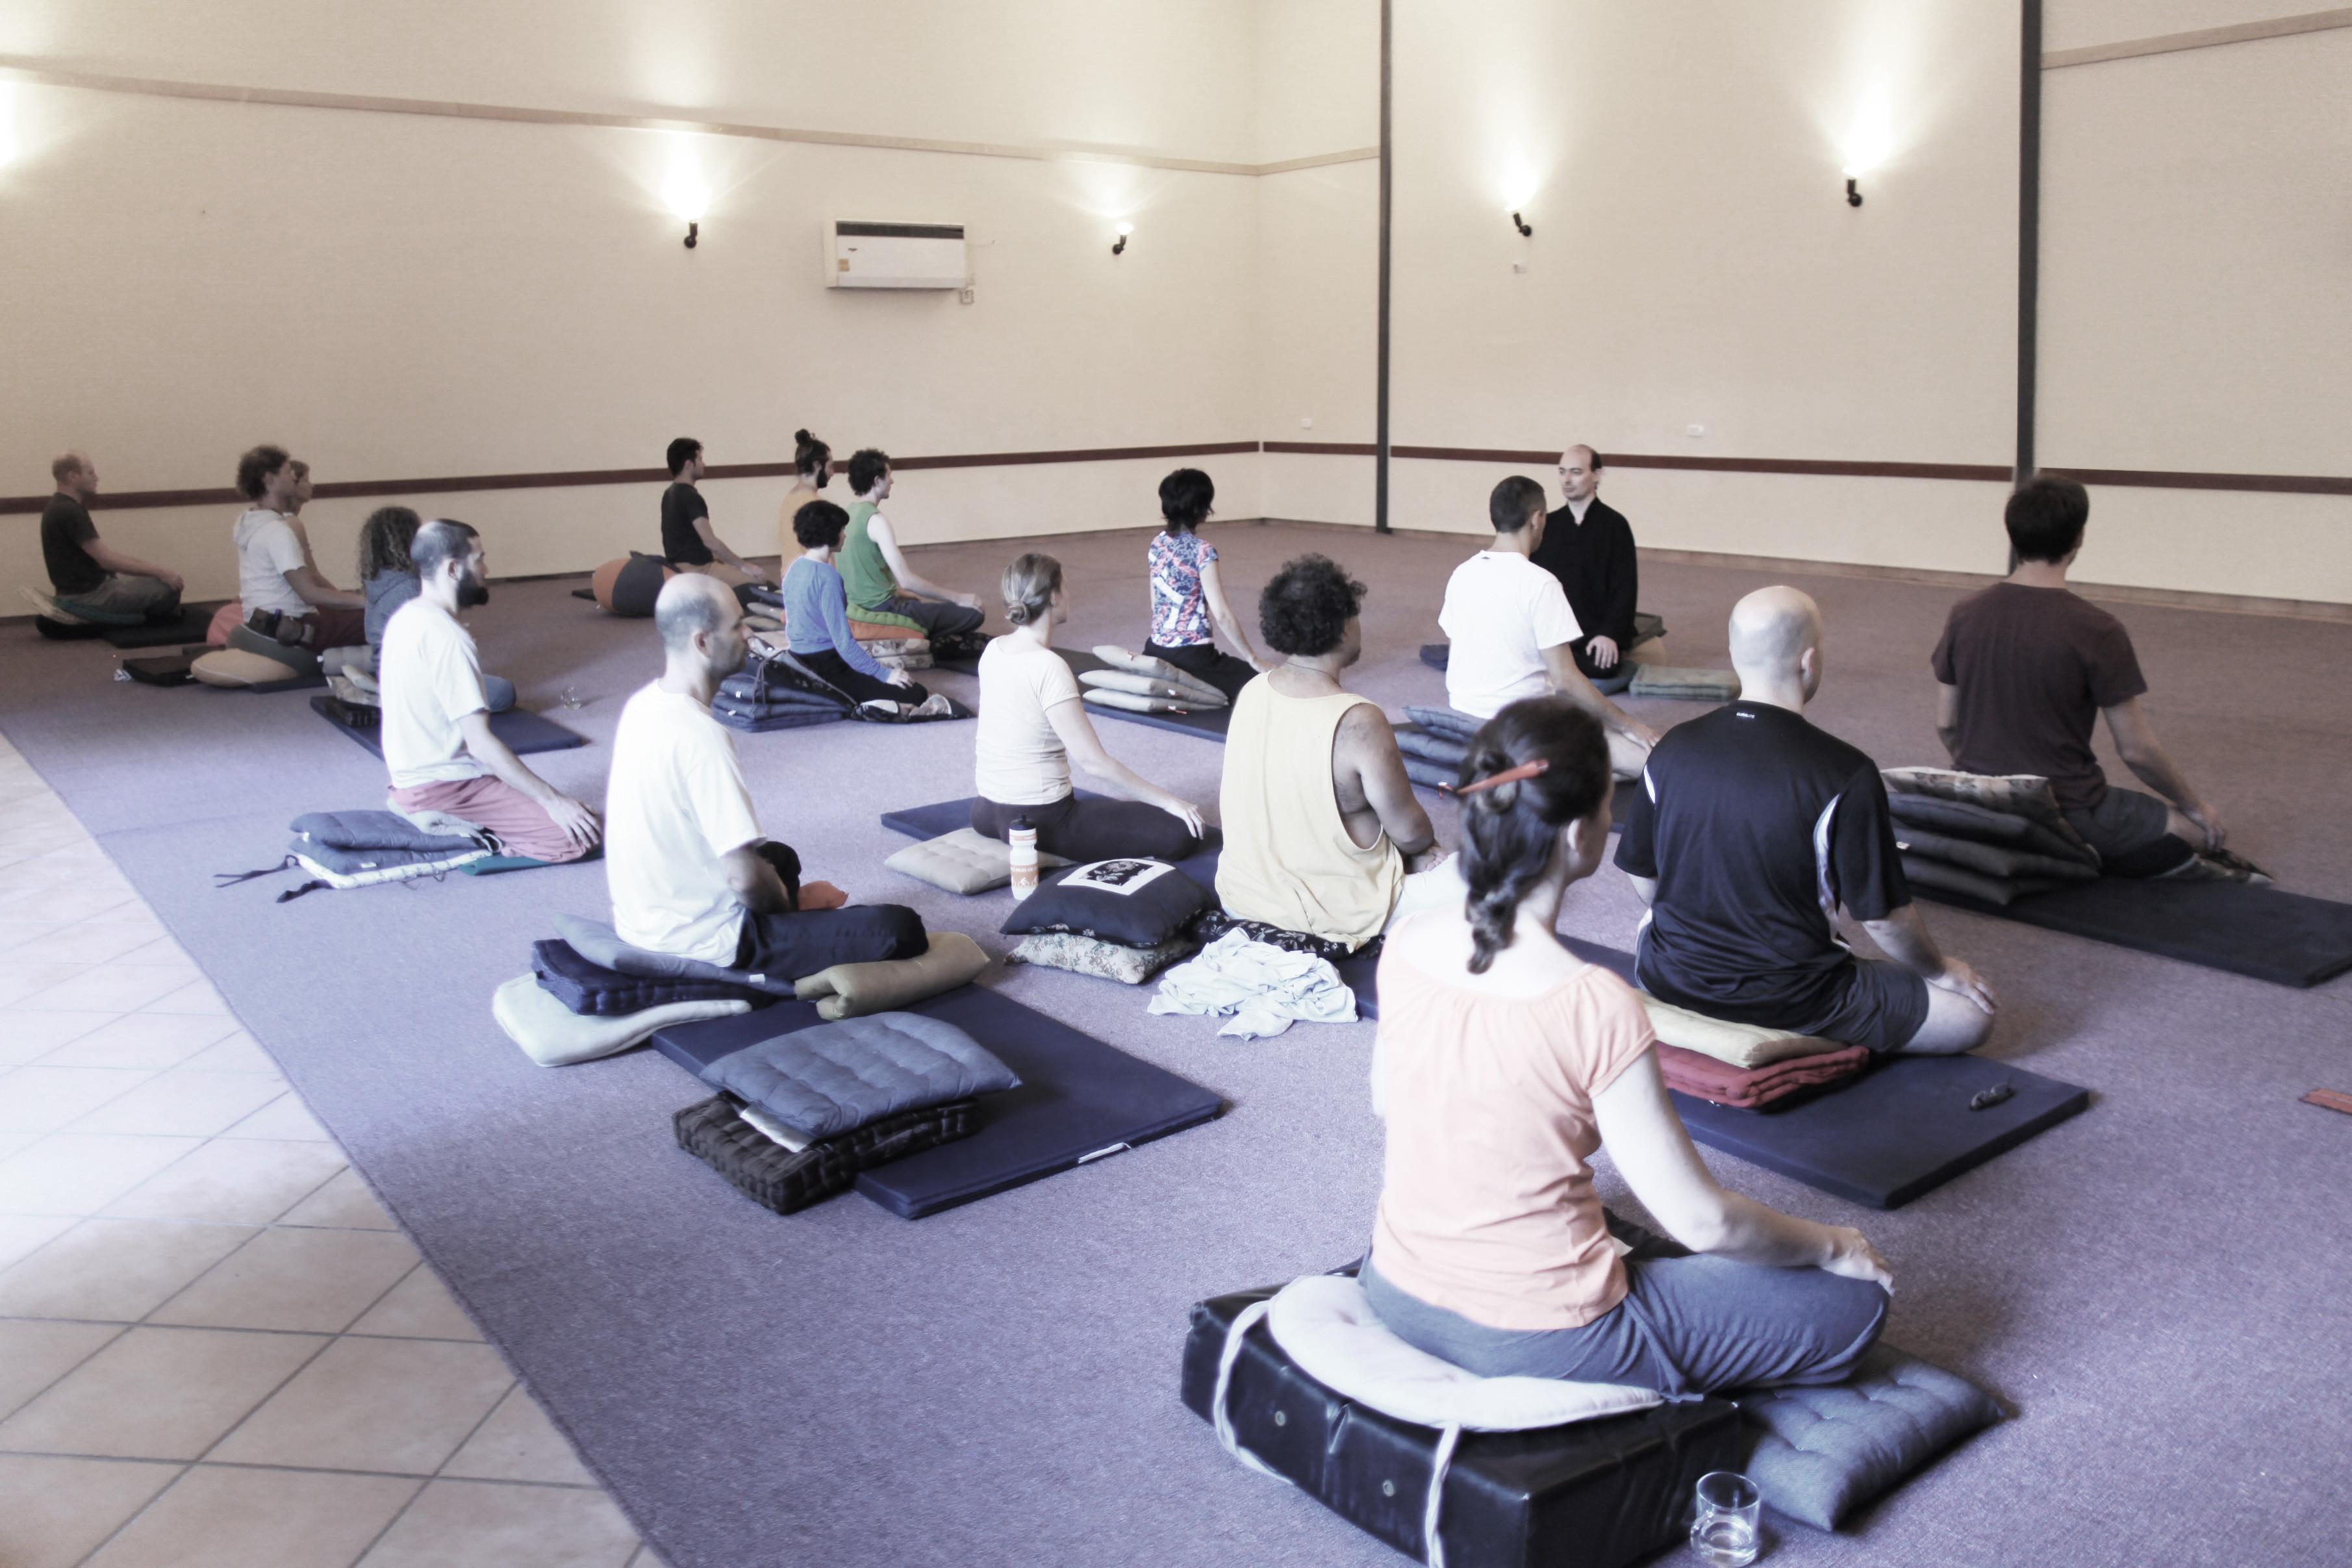 FREE MEDITATION & QIGONG CLASS